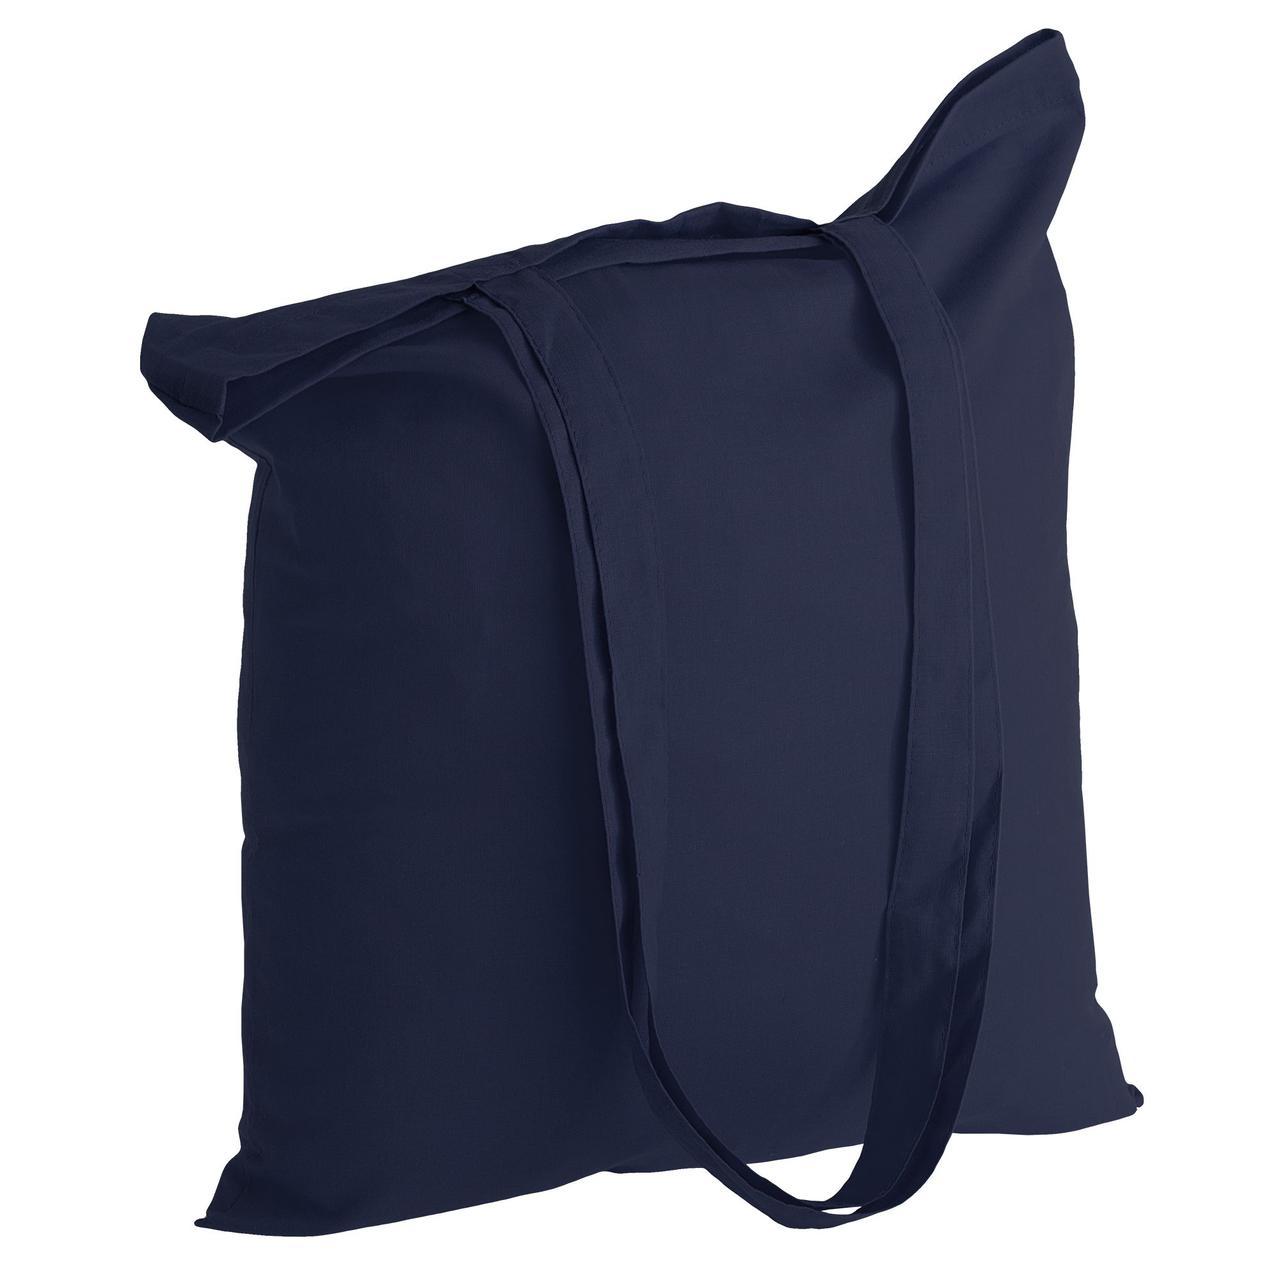 Холщовая сумка Basic 105, темно-синяя (артикул 1292.40)